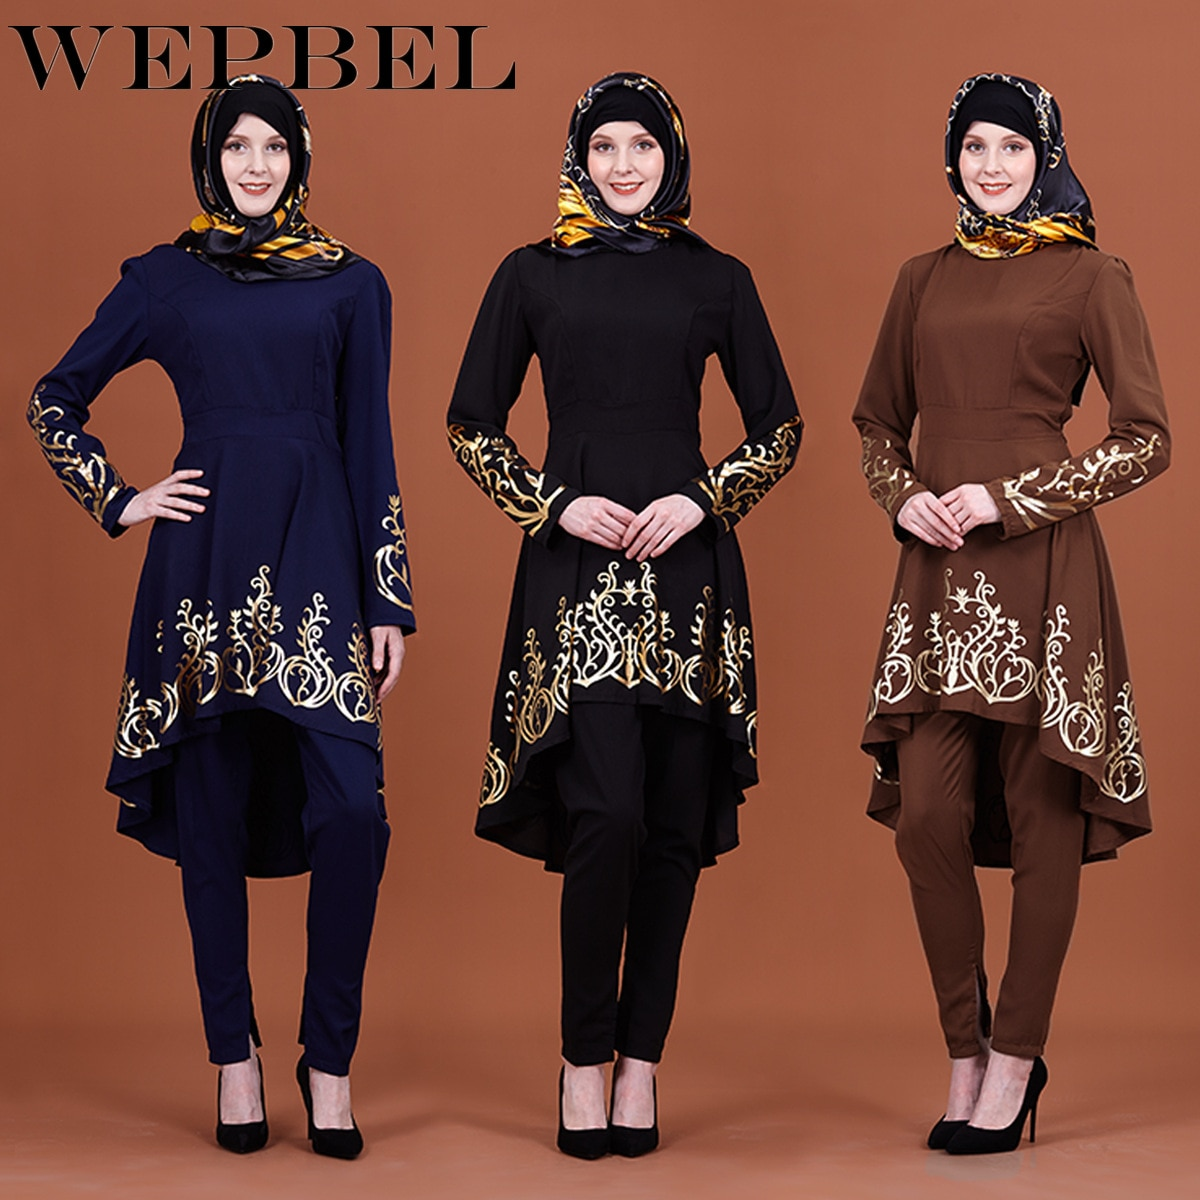 Impressão Dourada WEPBEL Muçulmano Roupas Ramadã Islâmico Abaya Oriente médio Cor Sólida das Mulheres